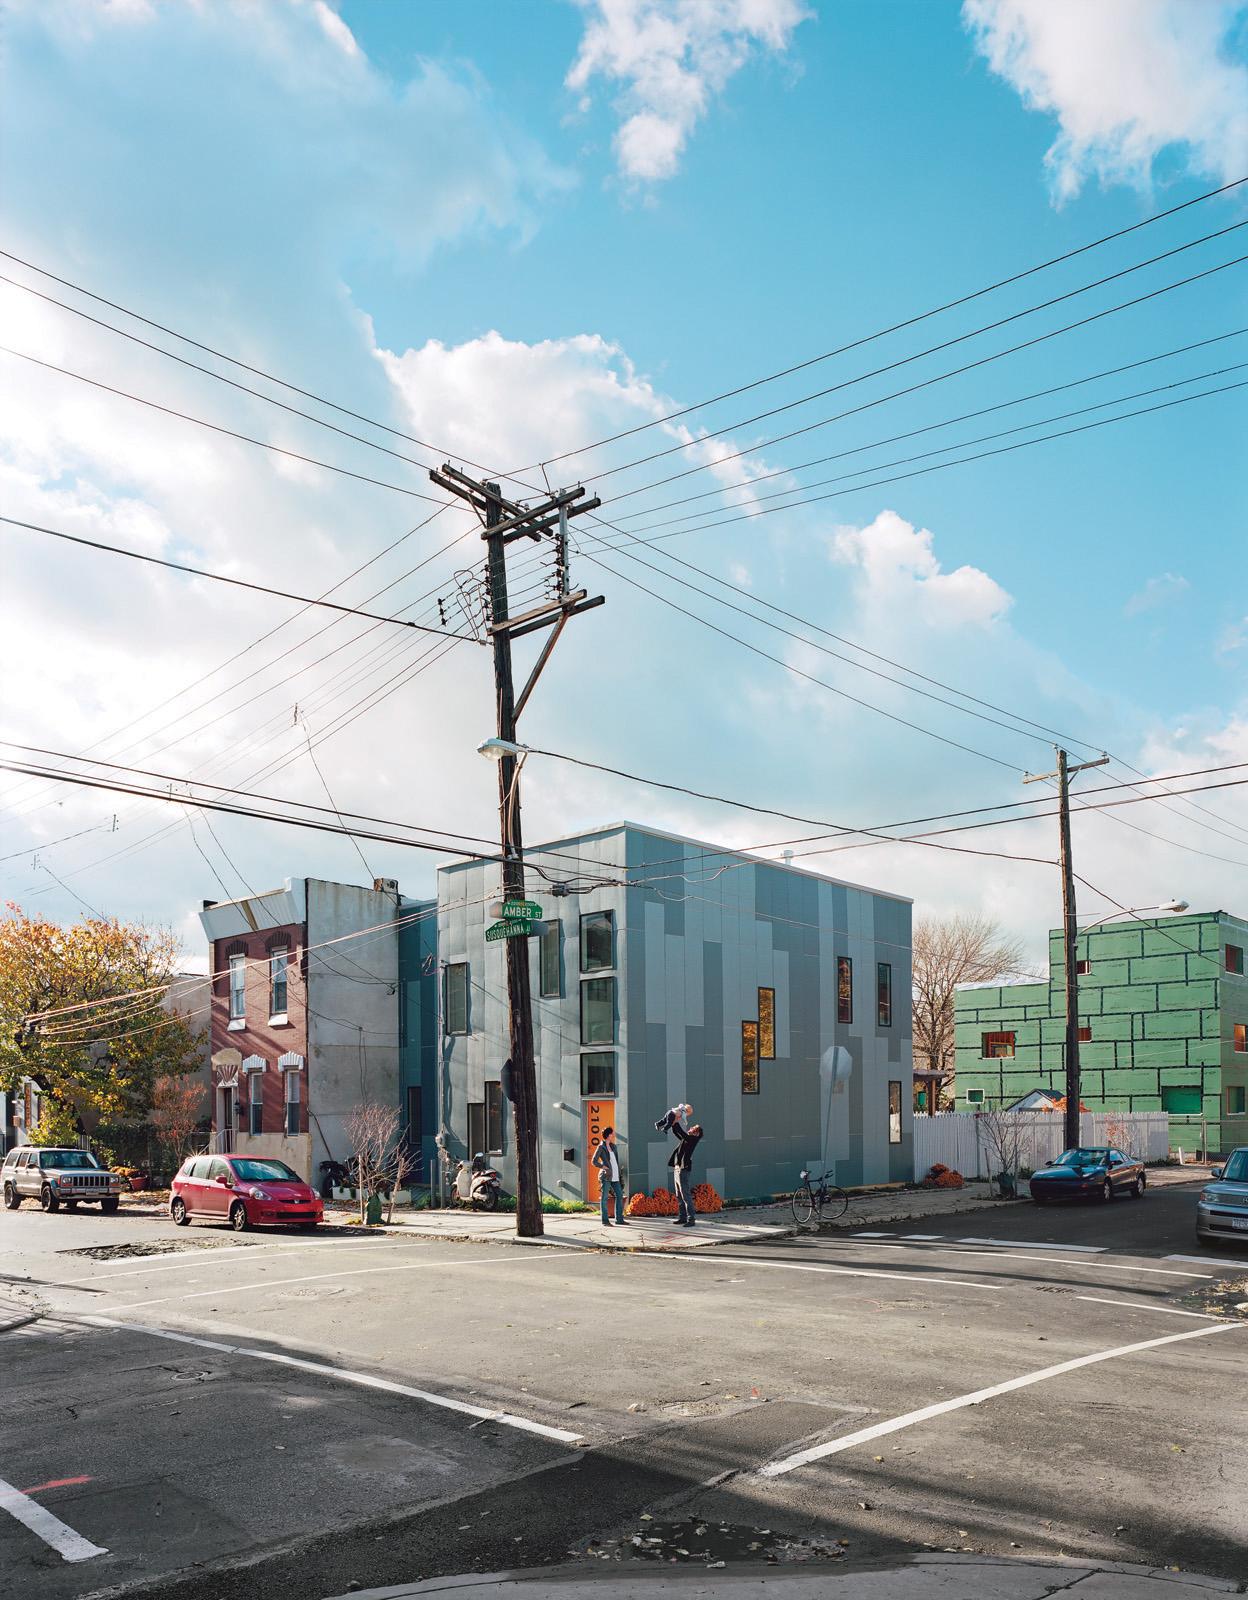 Modern box house made of HardiePanel siding